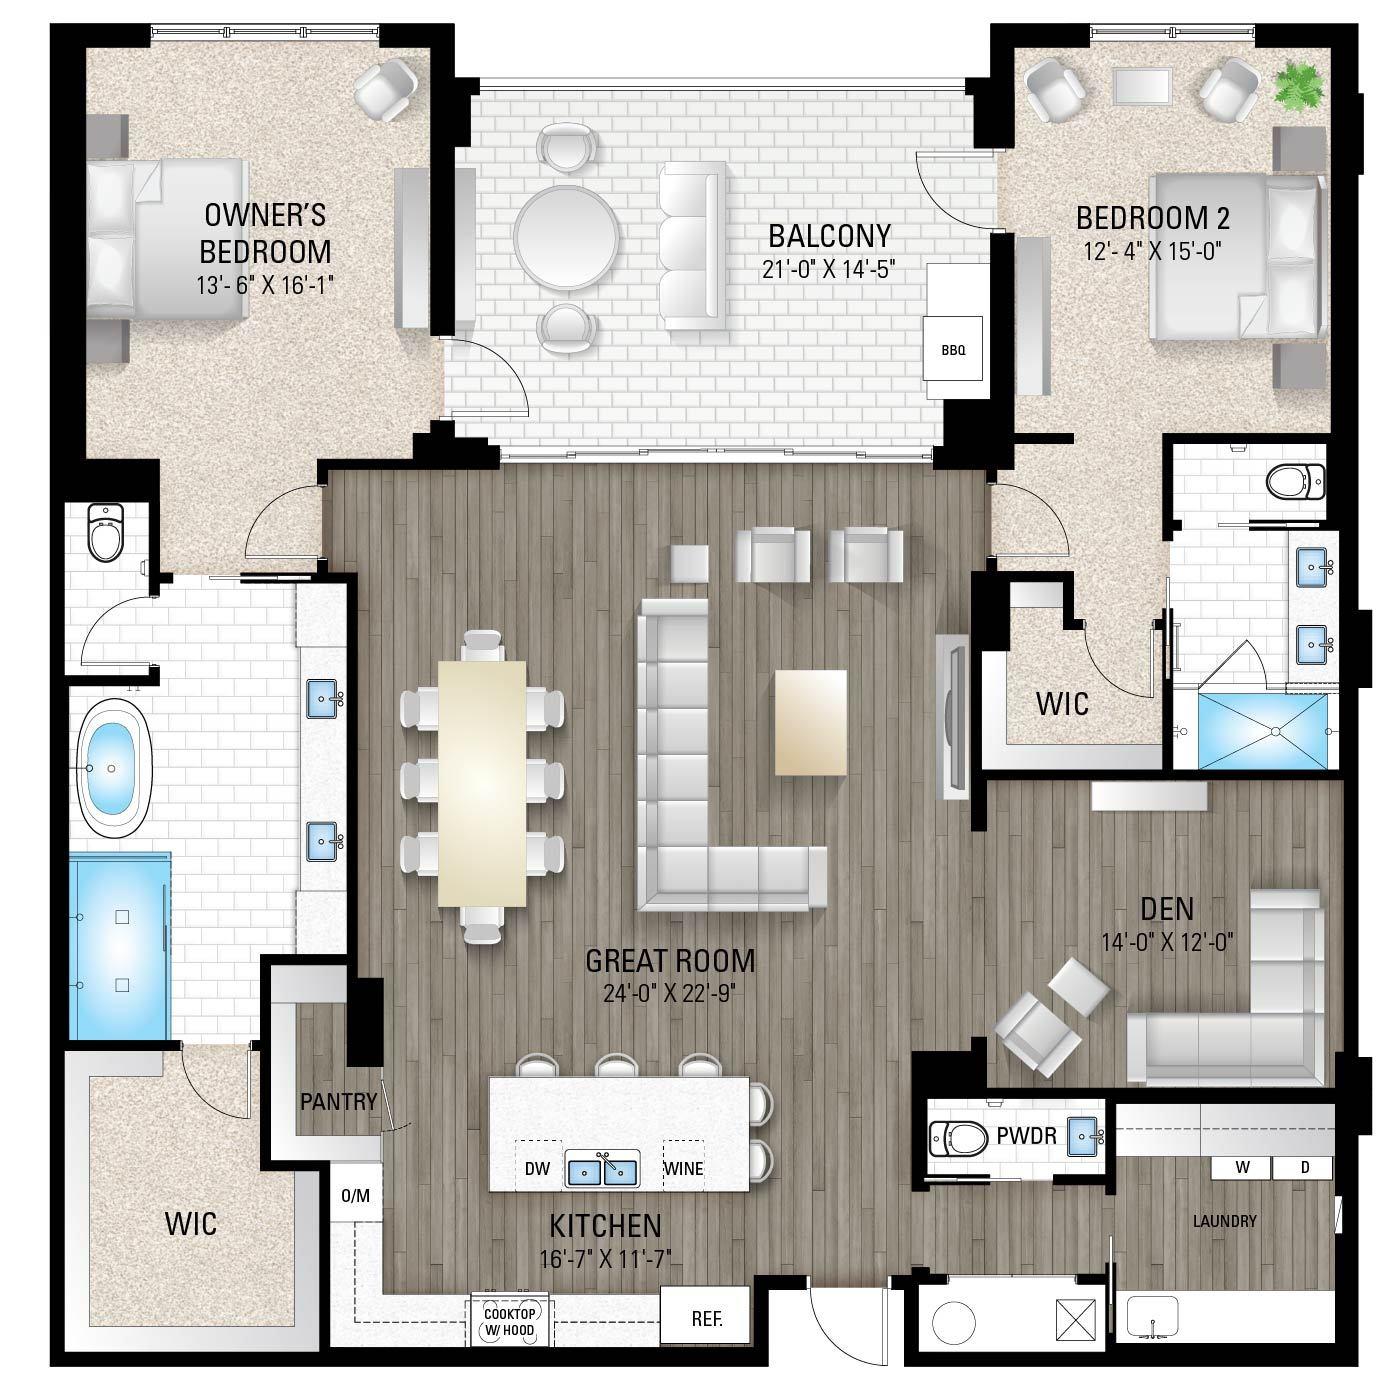 The Cheval 2:2 Bedrooms / 2.5 Baths / Den